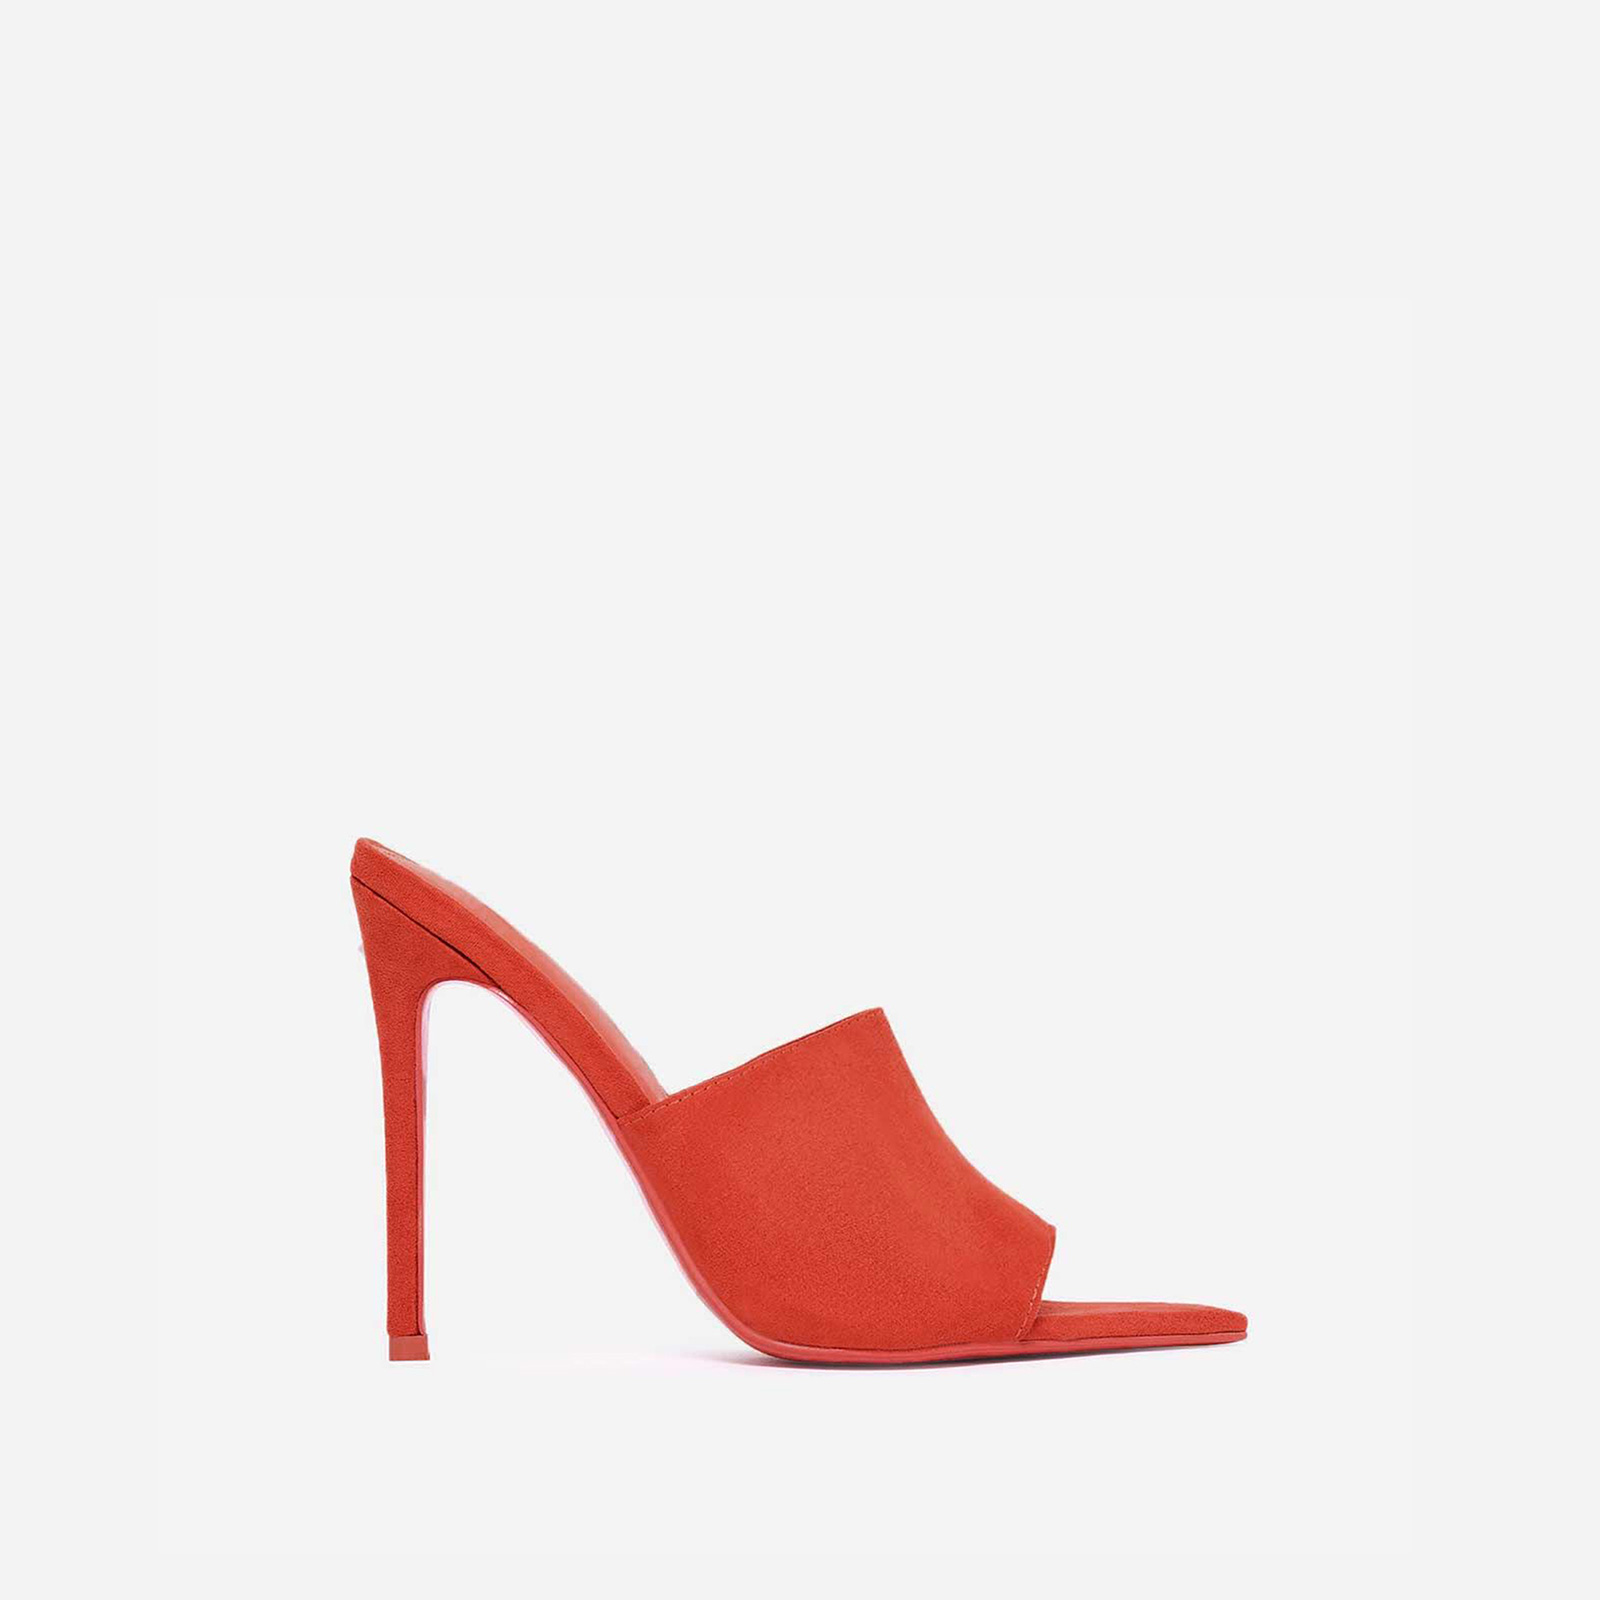 Cece Pointed Peep Toe Mule In Orange Faux Suede